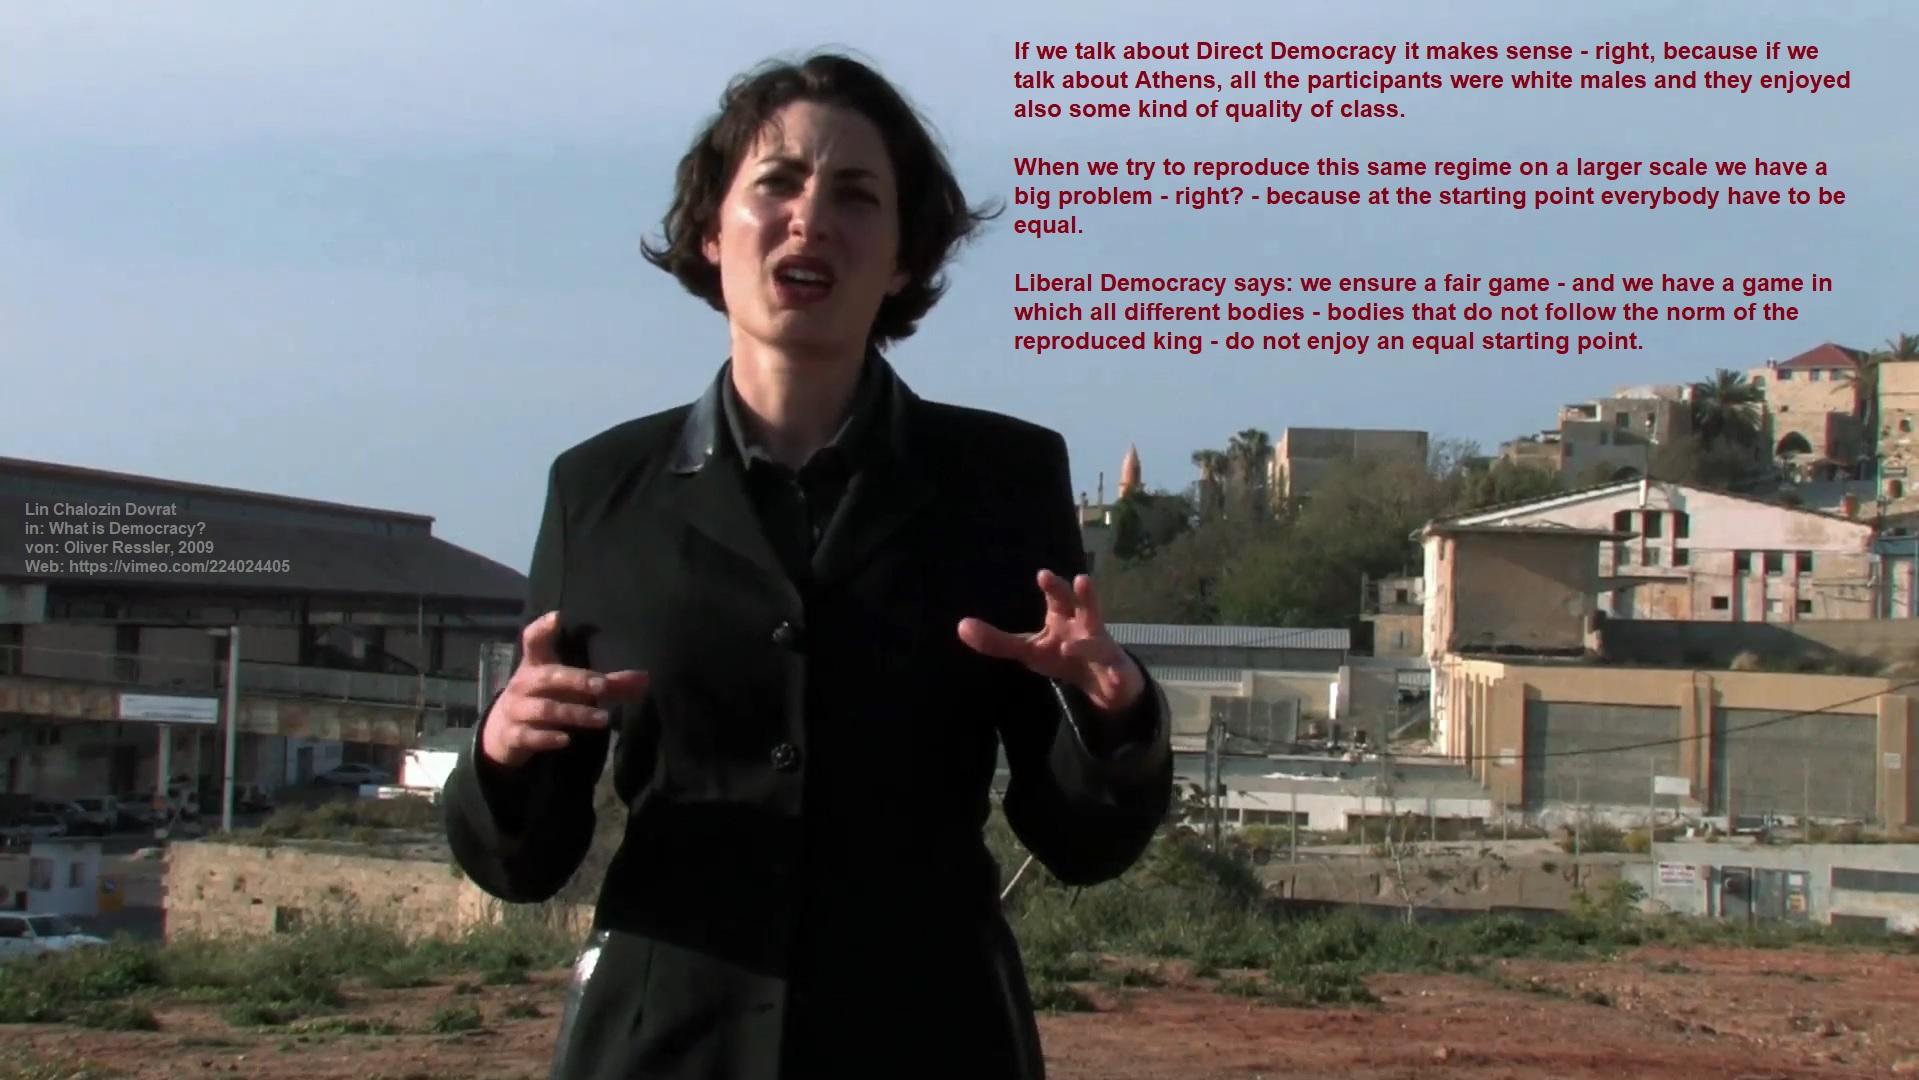 2009_Lin-Chalozin-Dovrat_in_What-is-Democracy